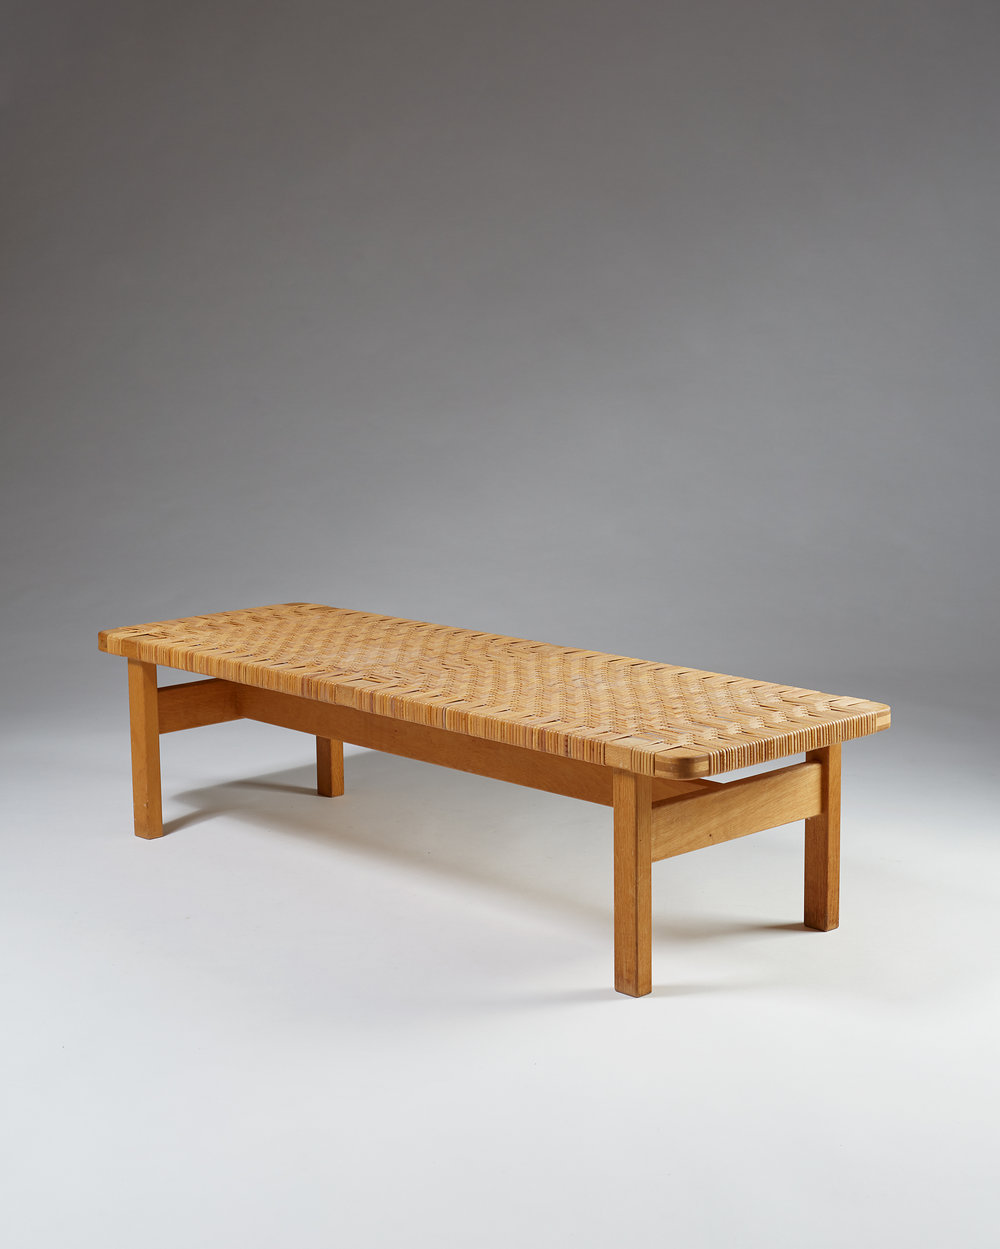 Börge Mogensen   Occasional table/bench model 5272 Denmark, 1950's Oak and cane. 34,5 x 138 x 46 cm